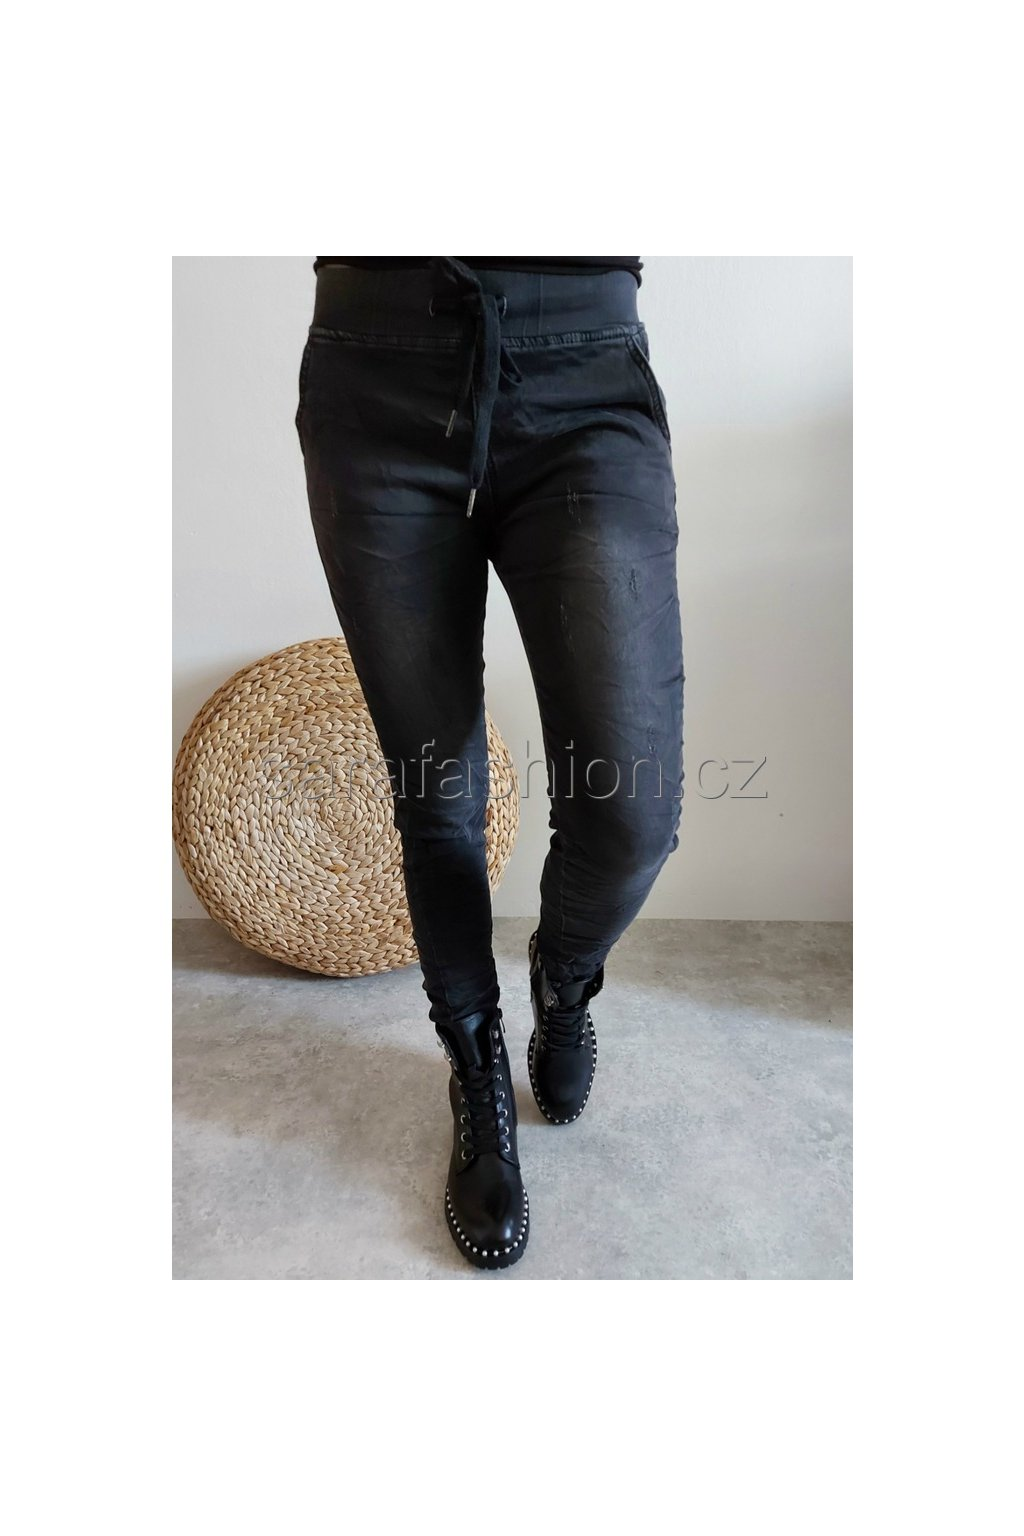 "Jeans kalhoty ""lucas"""